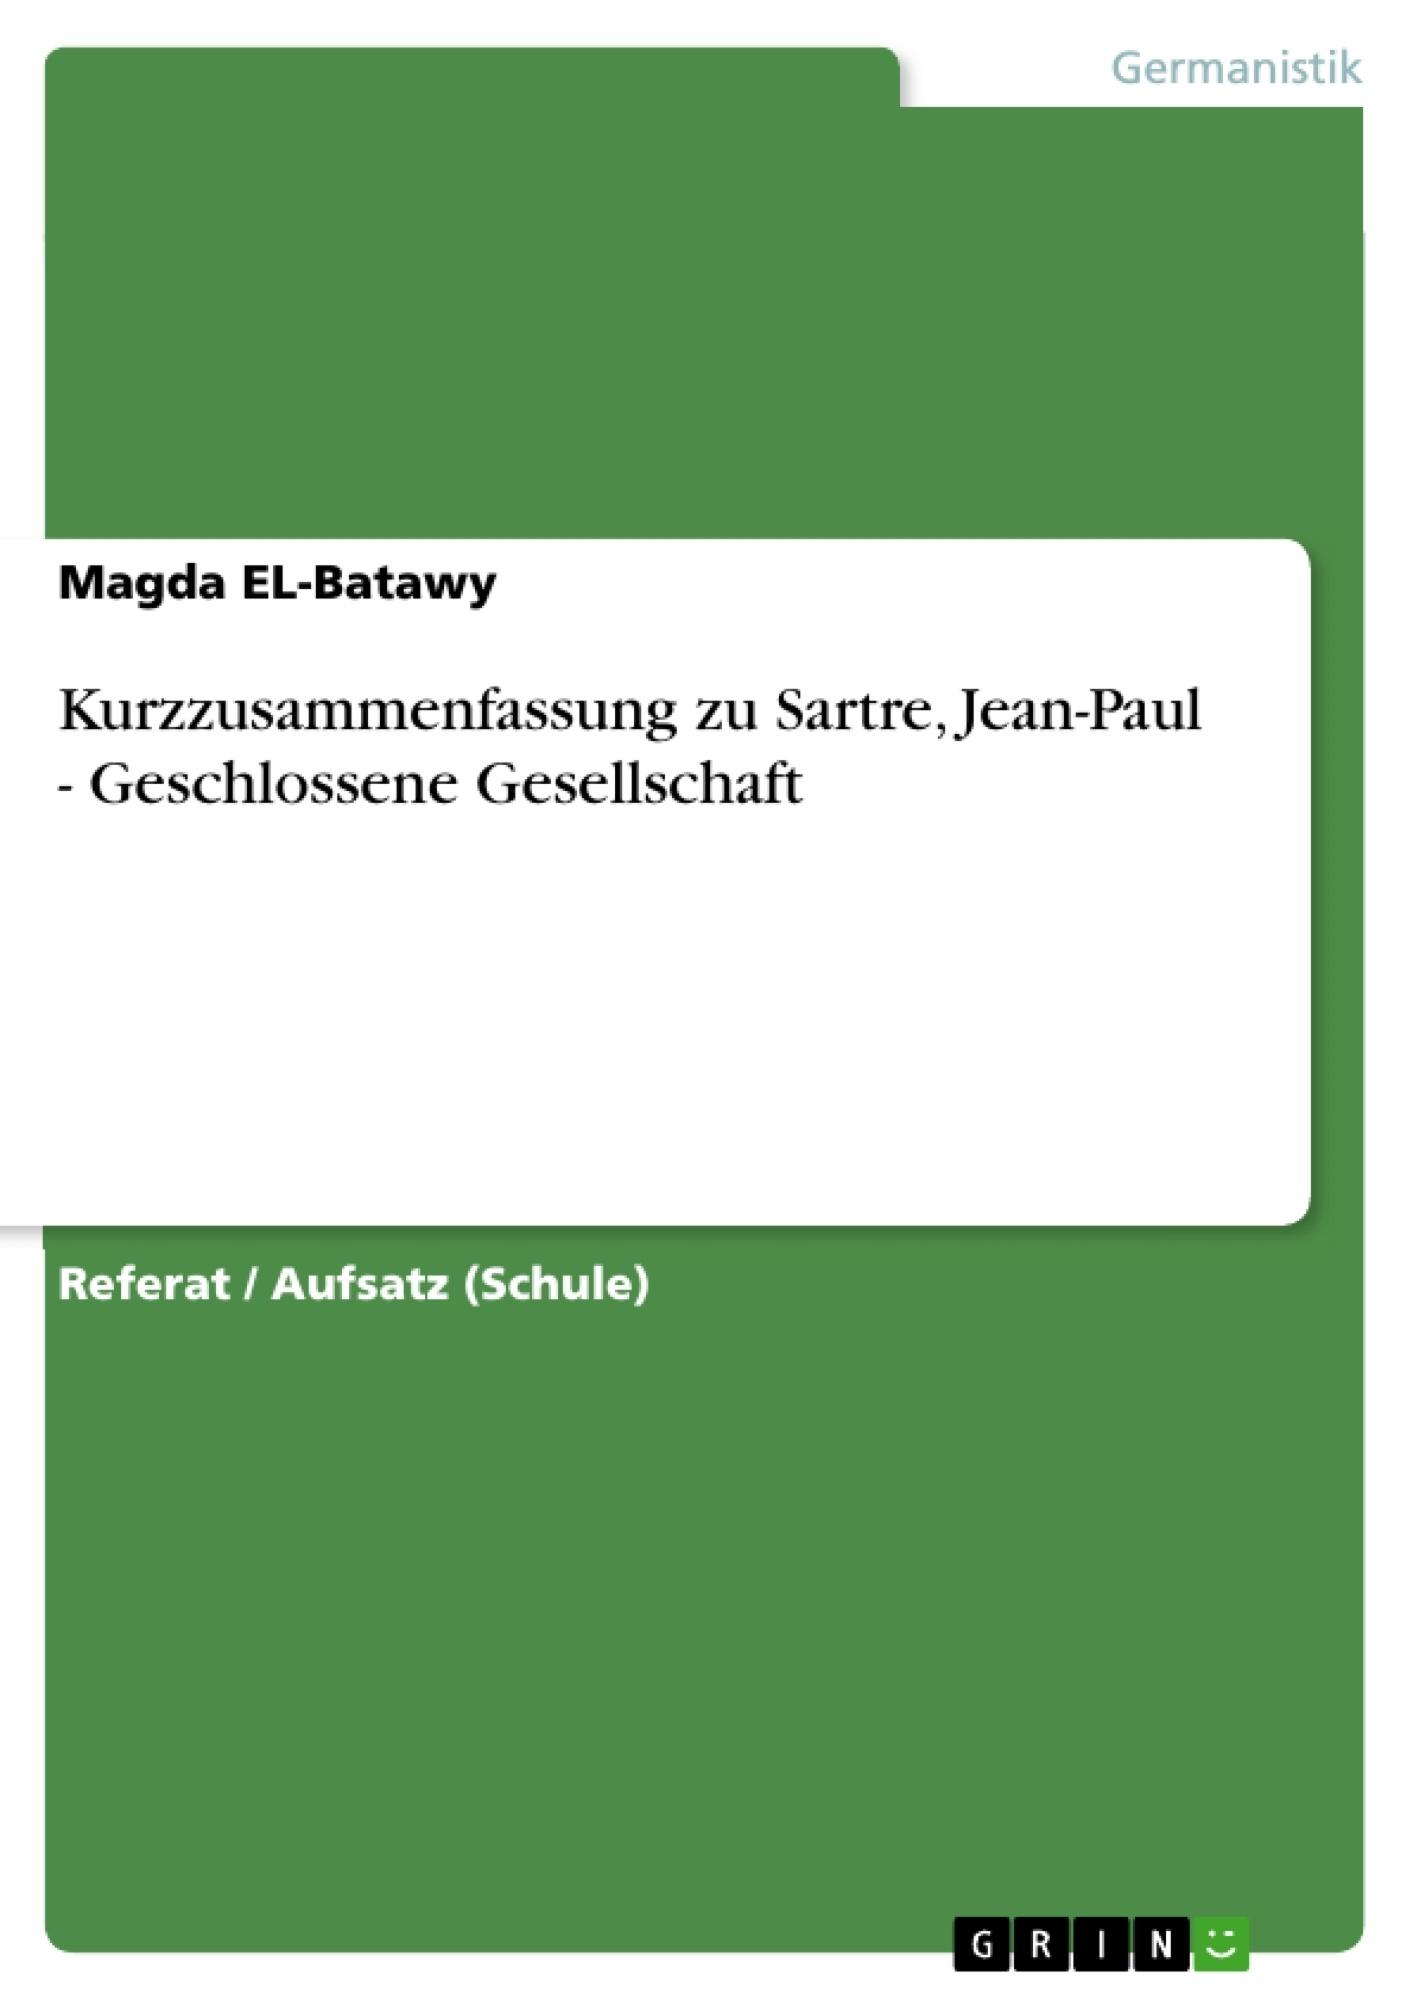 Titel: Kurzzusammenfassung zu Sartre, Jean-Paul - Geschlossene Gesellschaft